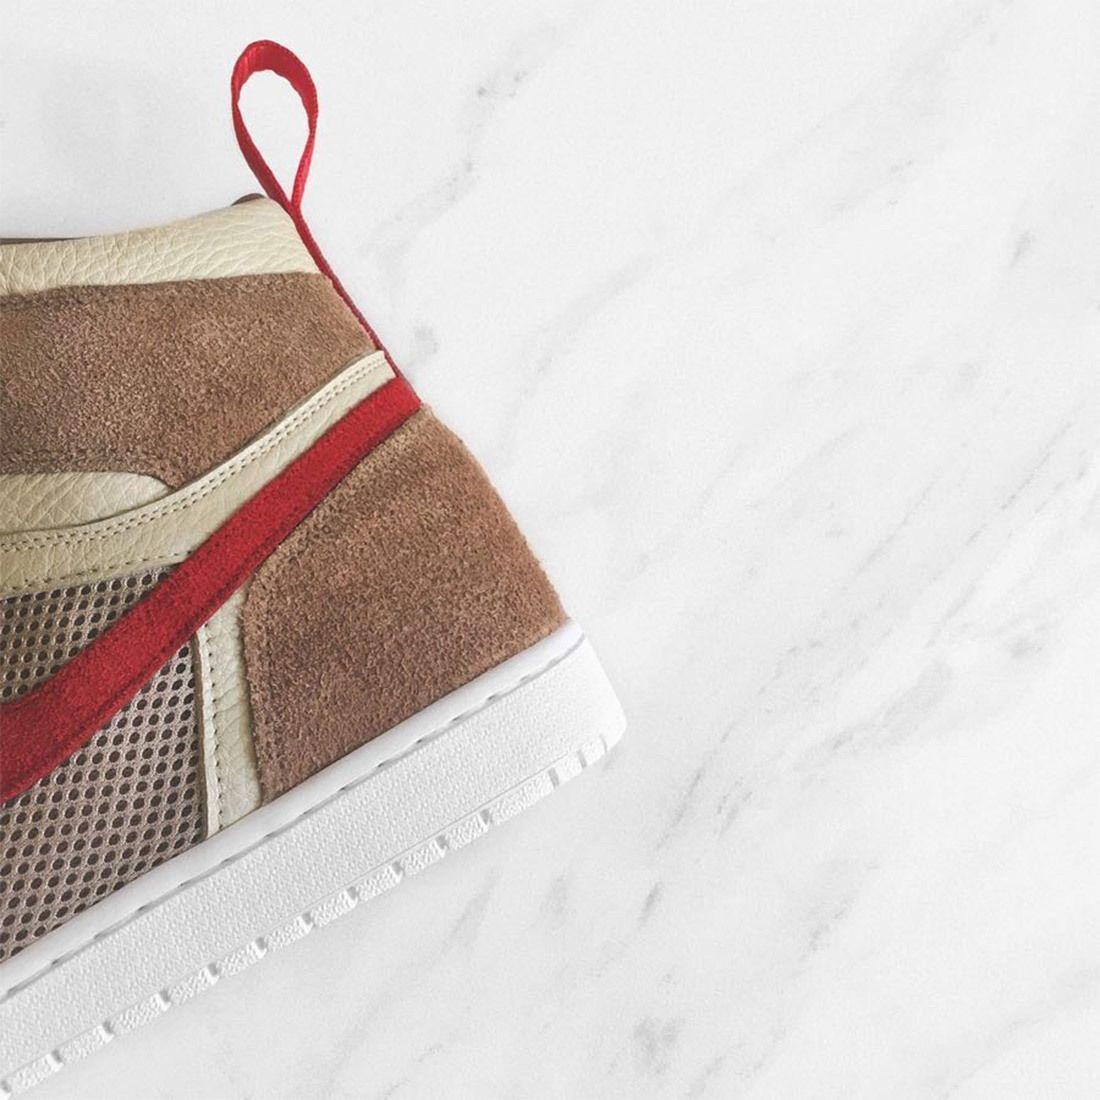 Chase Shiel X Fiammastudios Tom Sachs Nike Mars Yard Shoe Air Jordan 1 Sneaker Freaker 3